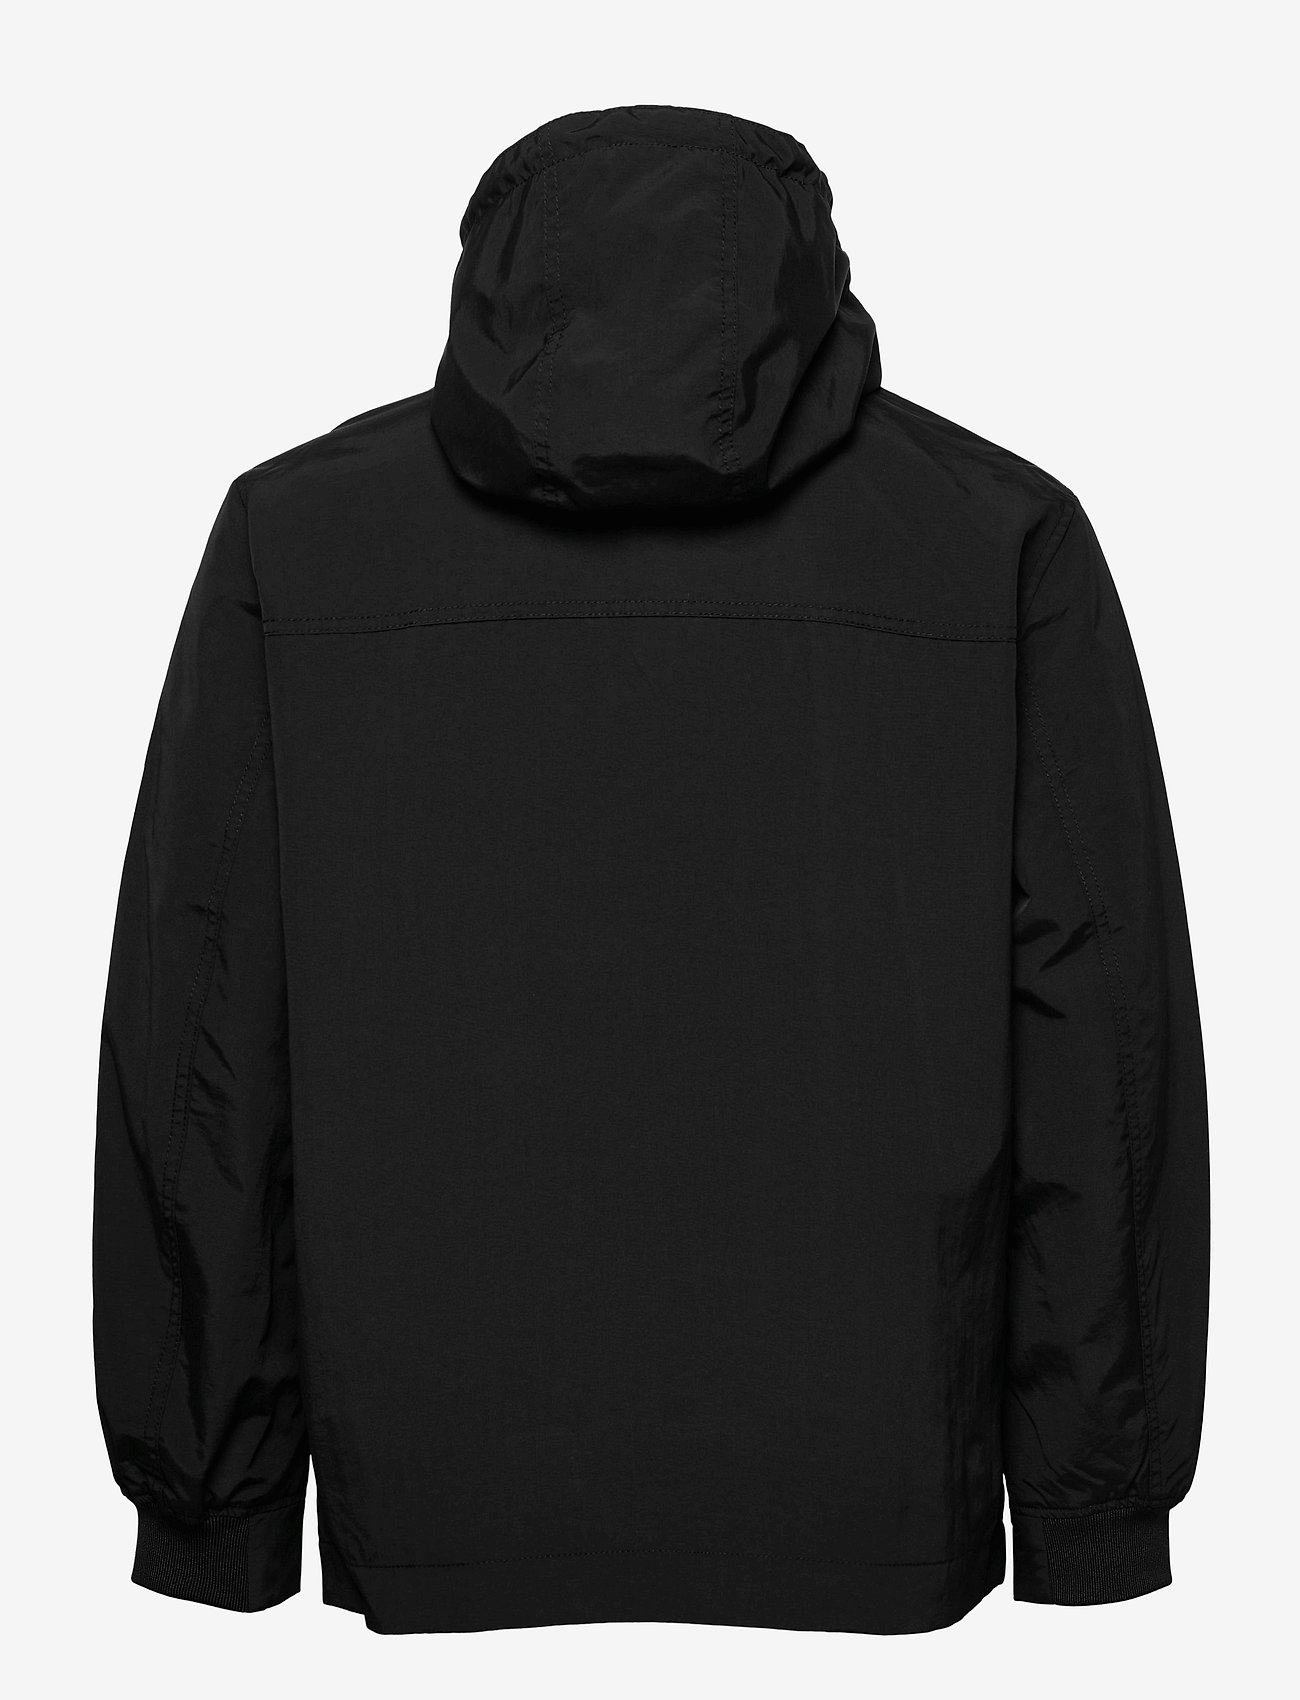 Tommy Jeans - TJM ESSENTIAL HOODED JACKET - vestes légères - black - 1